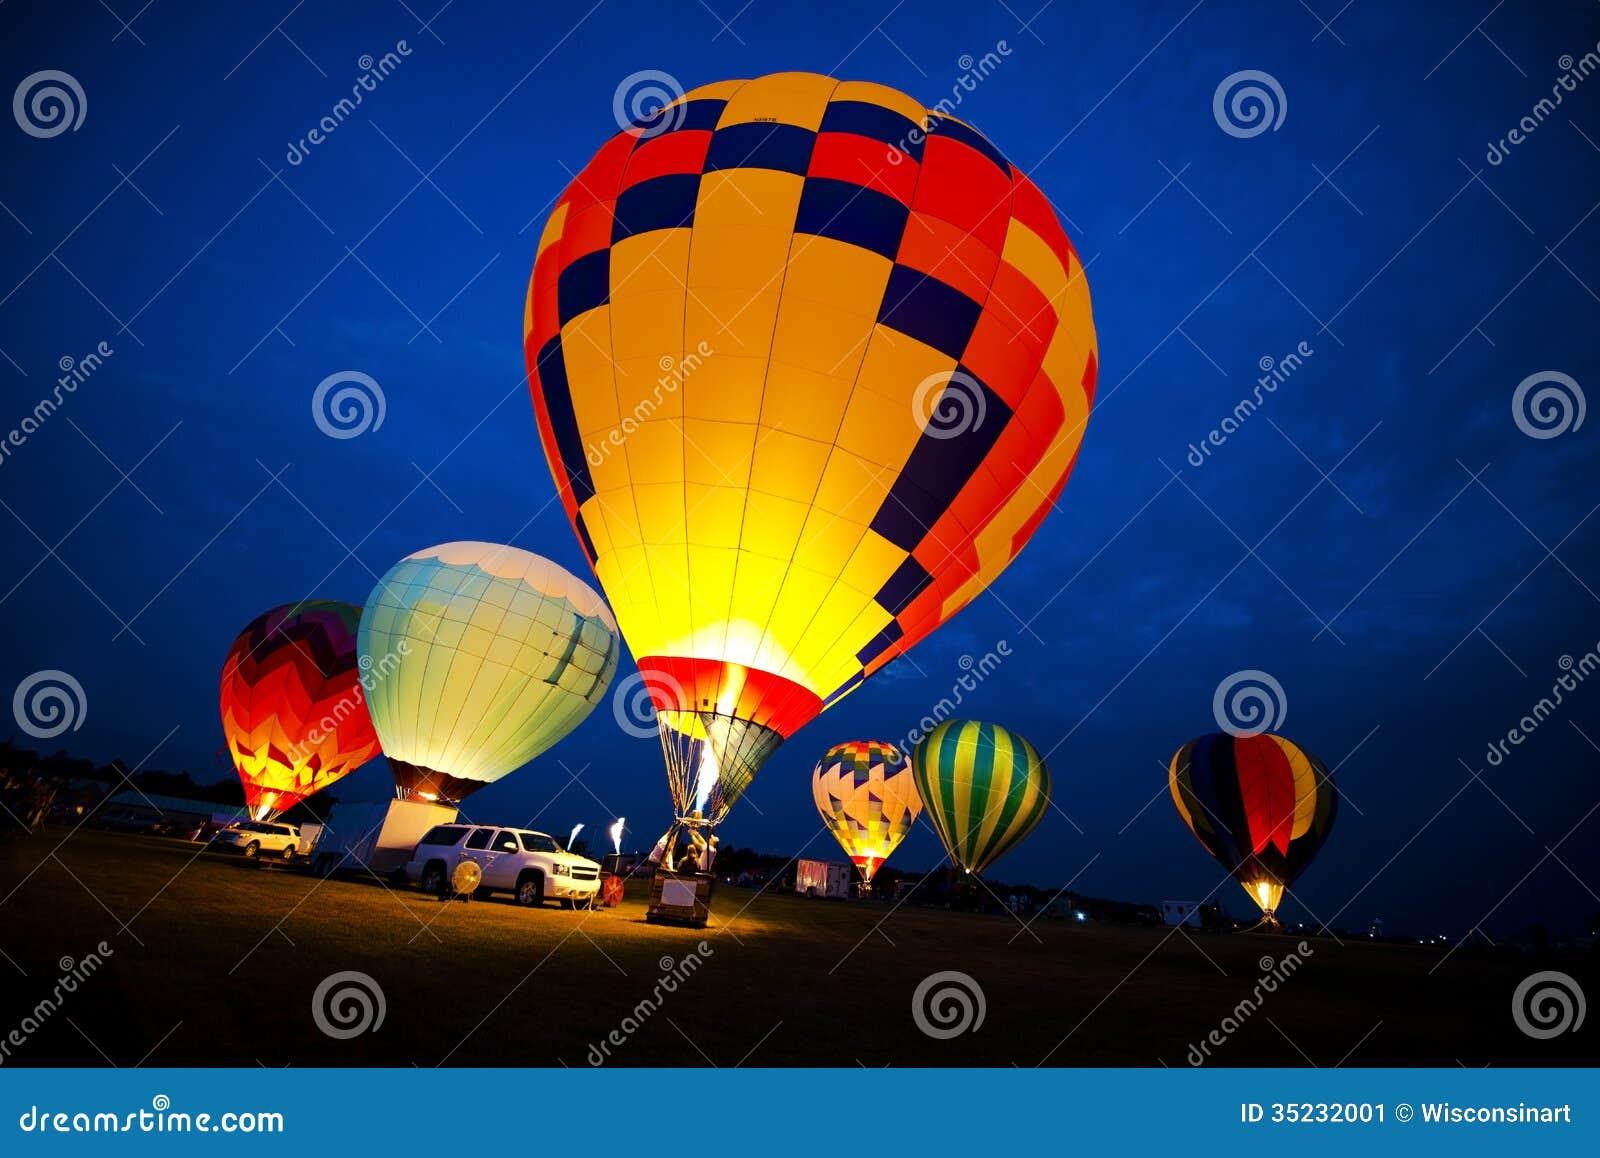 Ballonnen Met Licht : Heißluft ballon farben nachtglühen licht show glättend stockbild